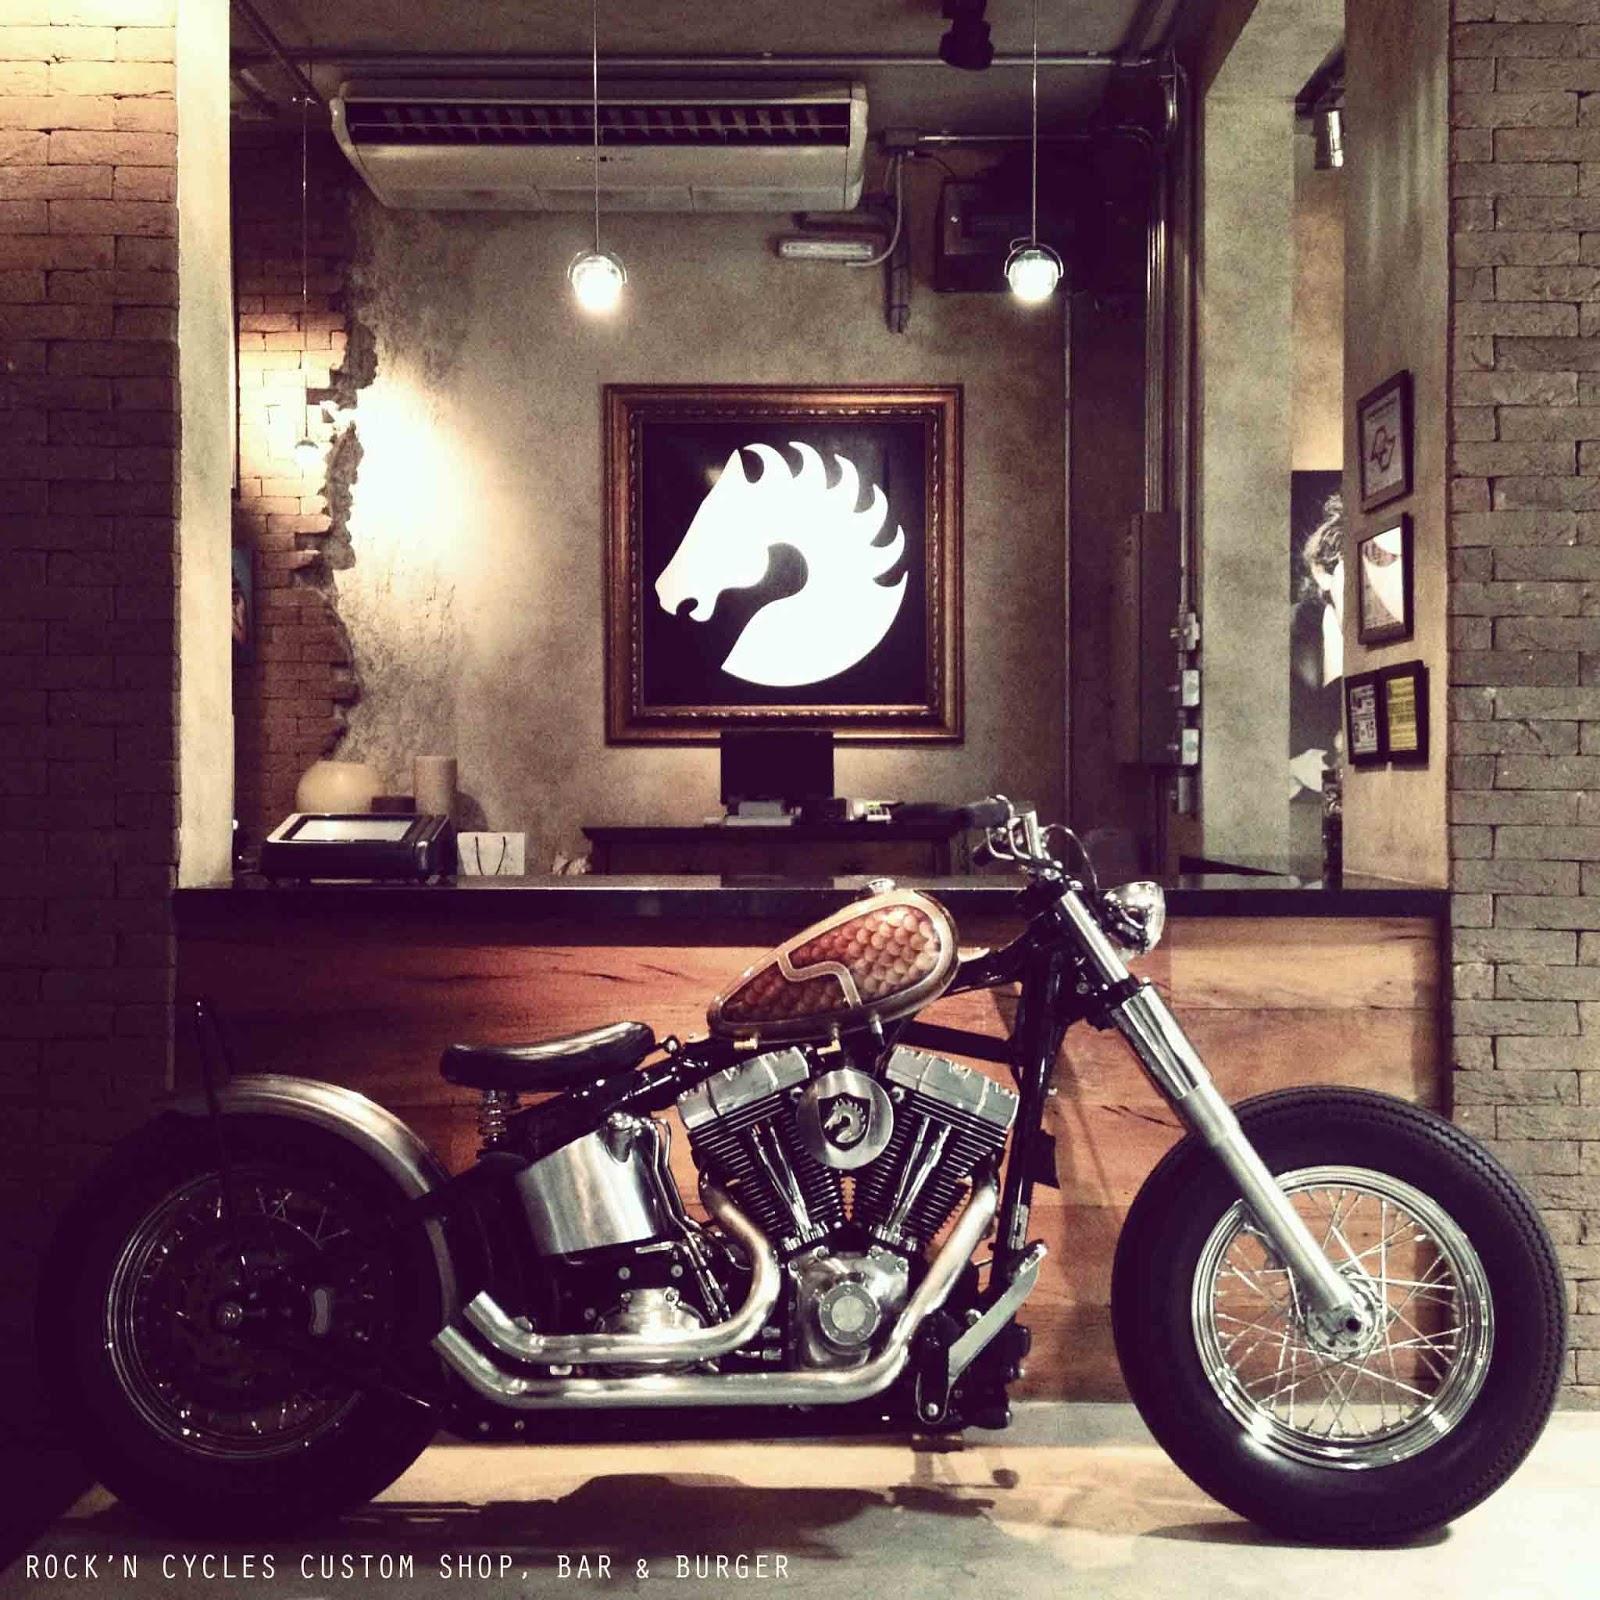 2013 Harley-Davidson Deluxe